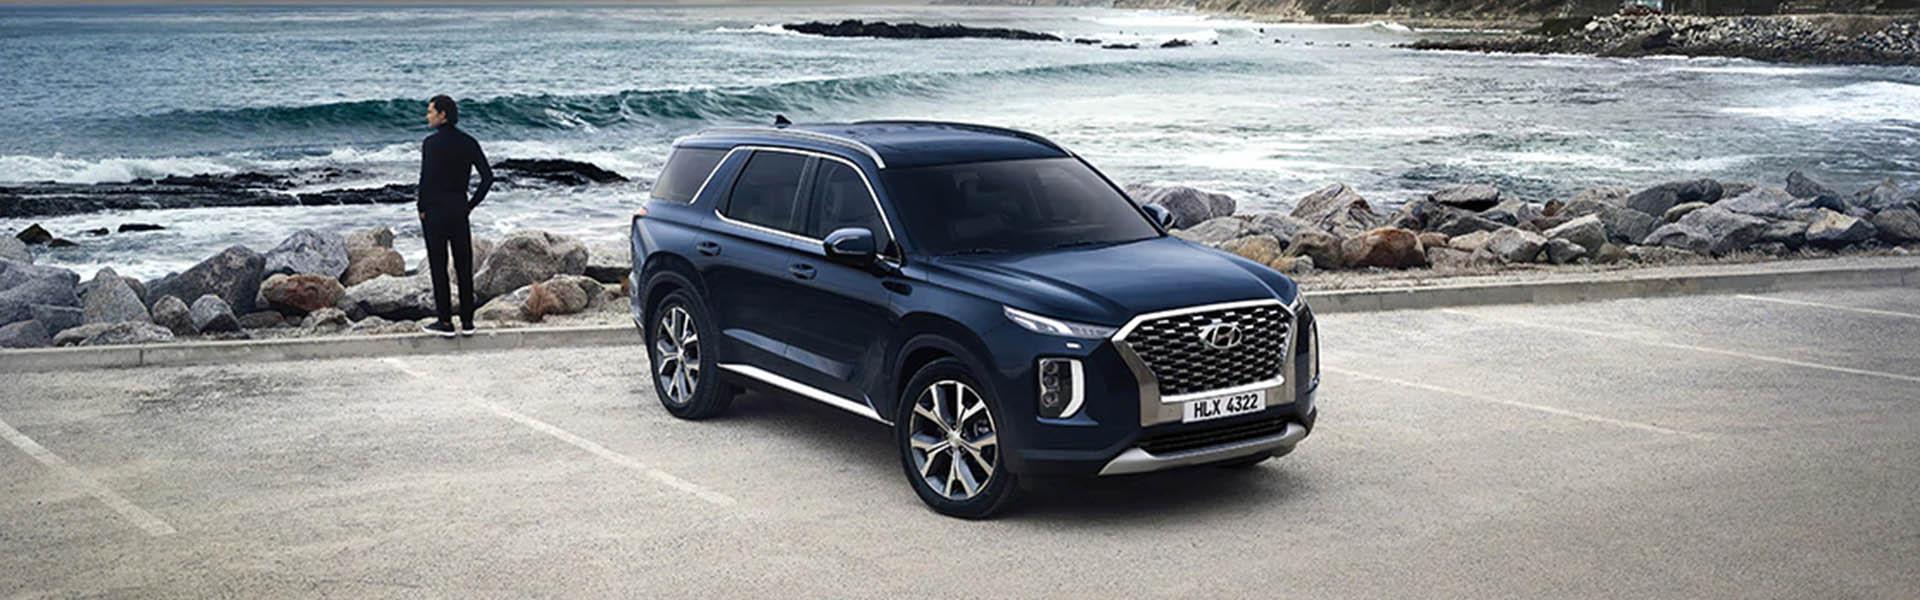 Hyundai Palisade - обзор